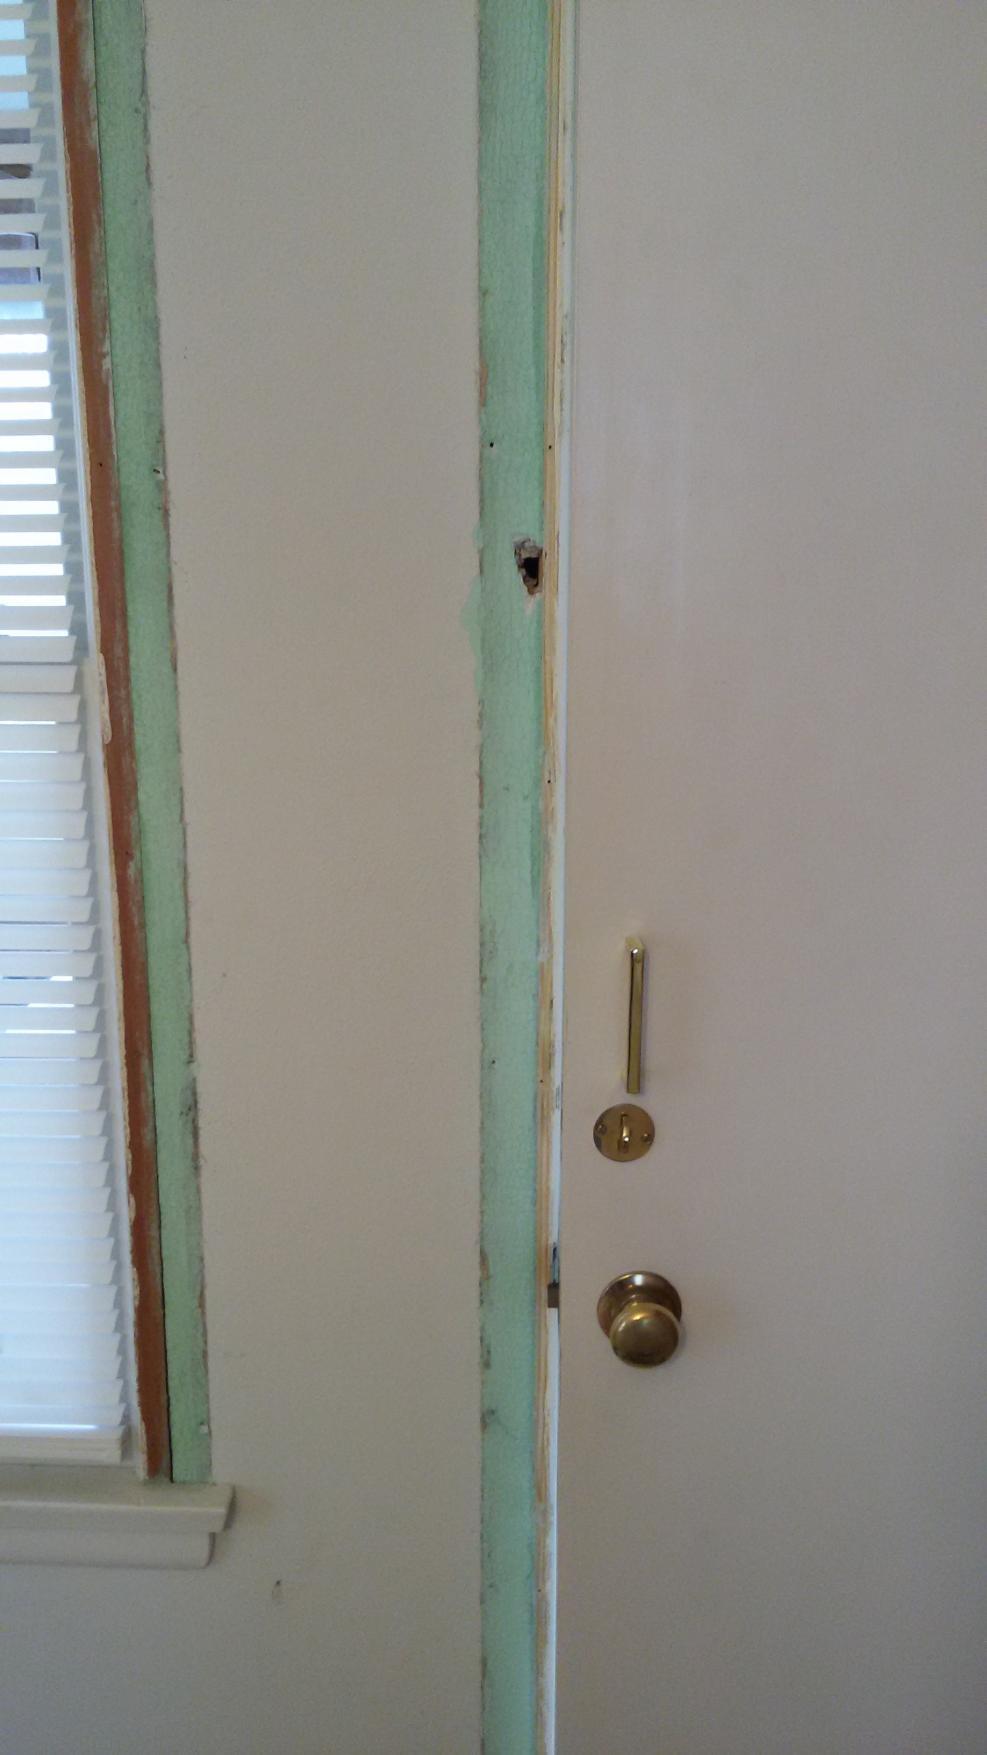 Door Jamb Issues With Exterior And Floor Brick Bathroom Lighting Fixture Electrical Doityourselfcom Thanks Guys